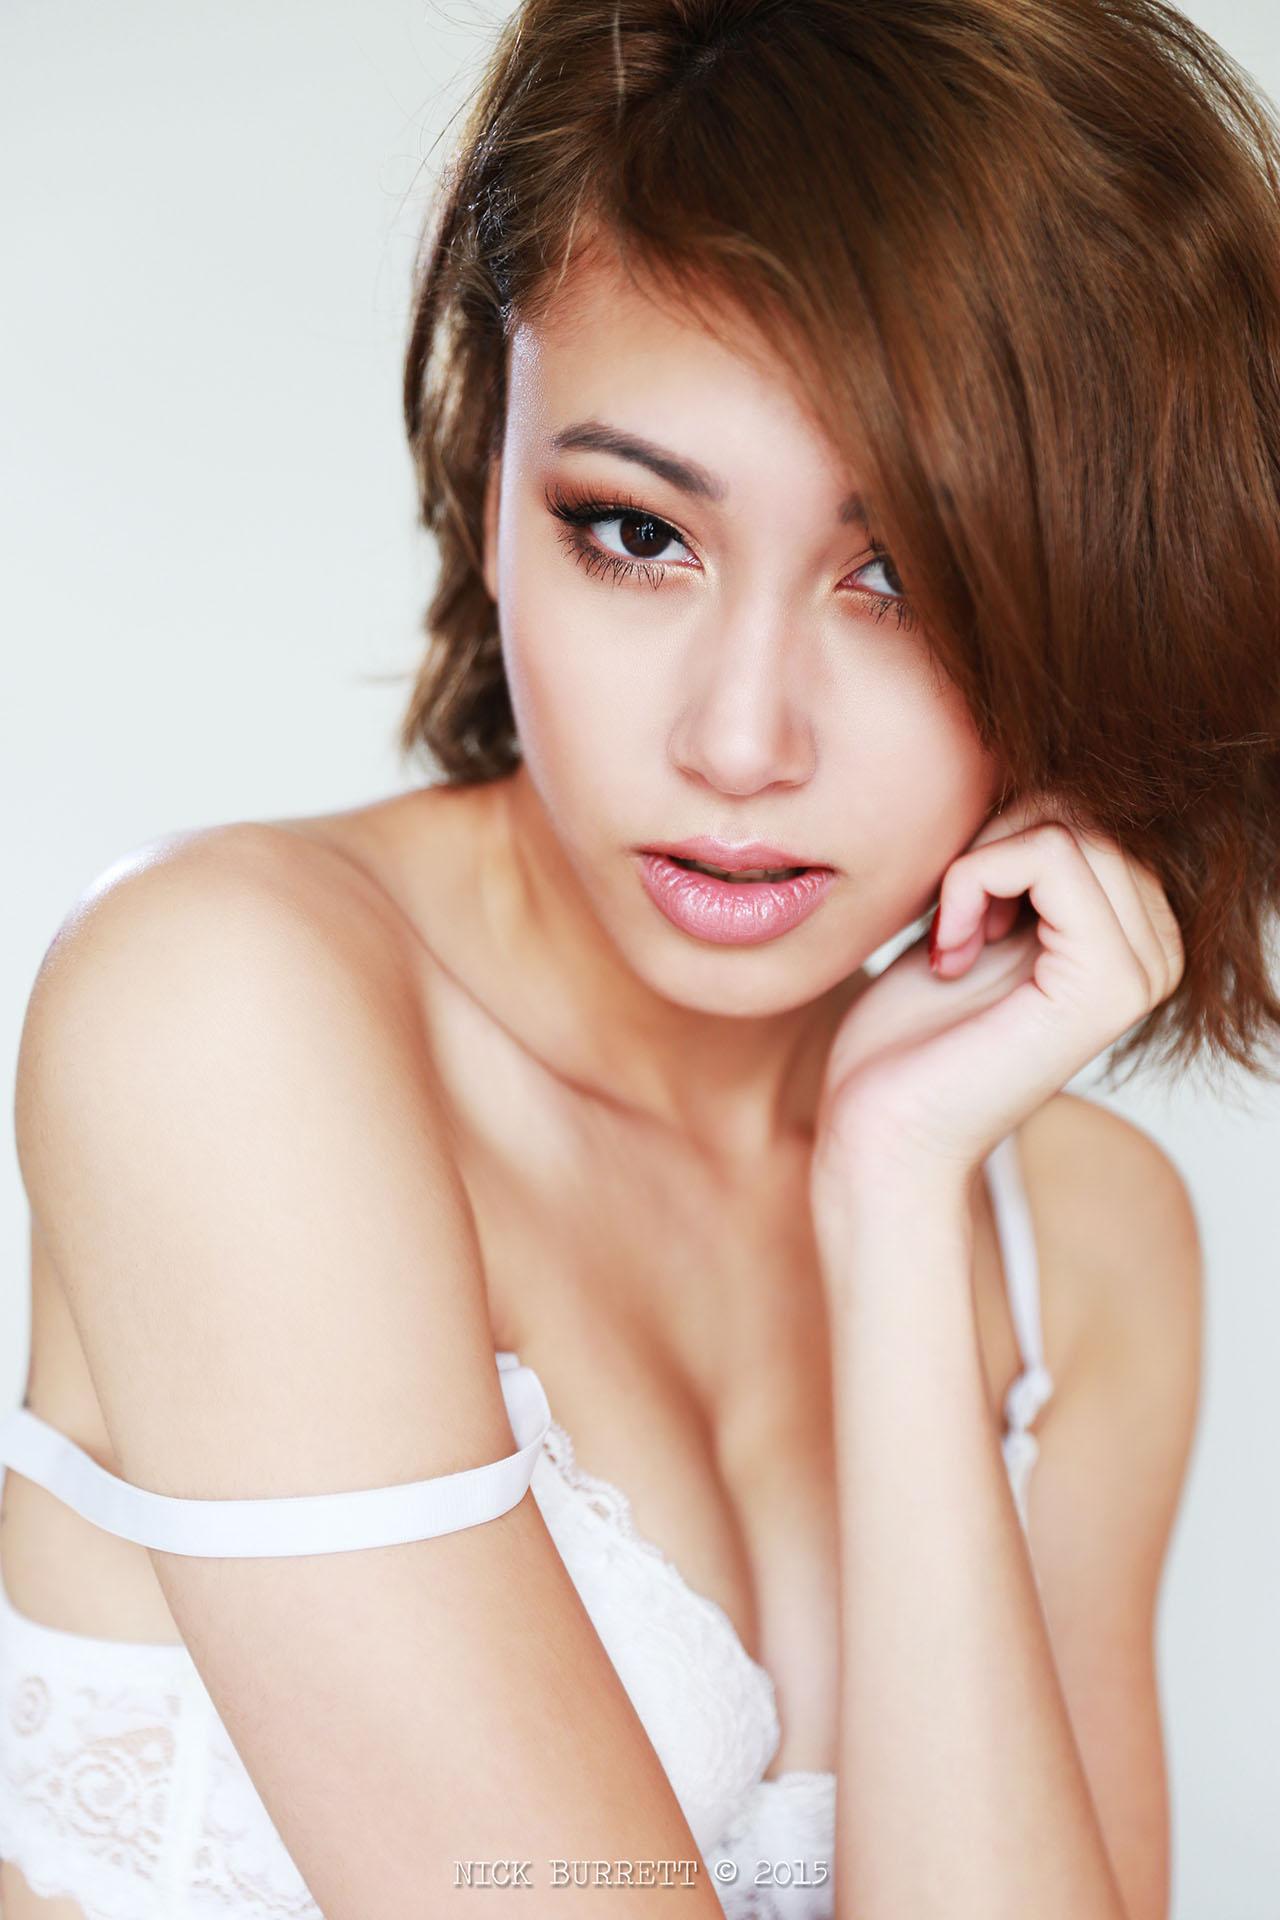 pailin_thira_sensual_boudoir_lingerie_fashion_bangkok_thailand_nick_burrett_photography_01